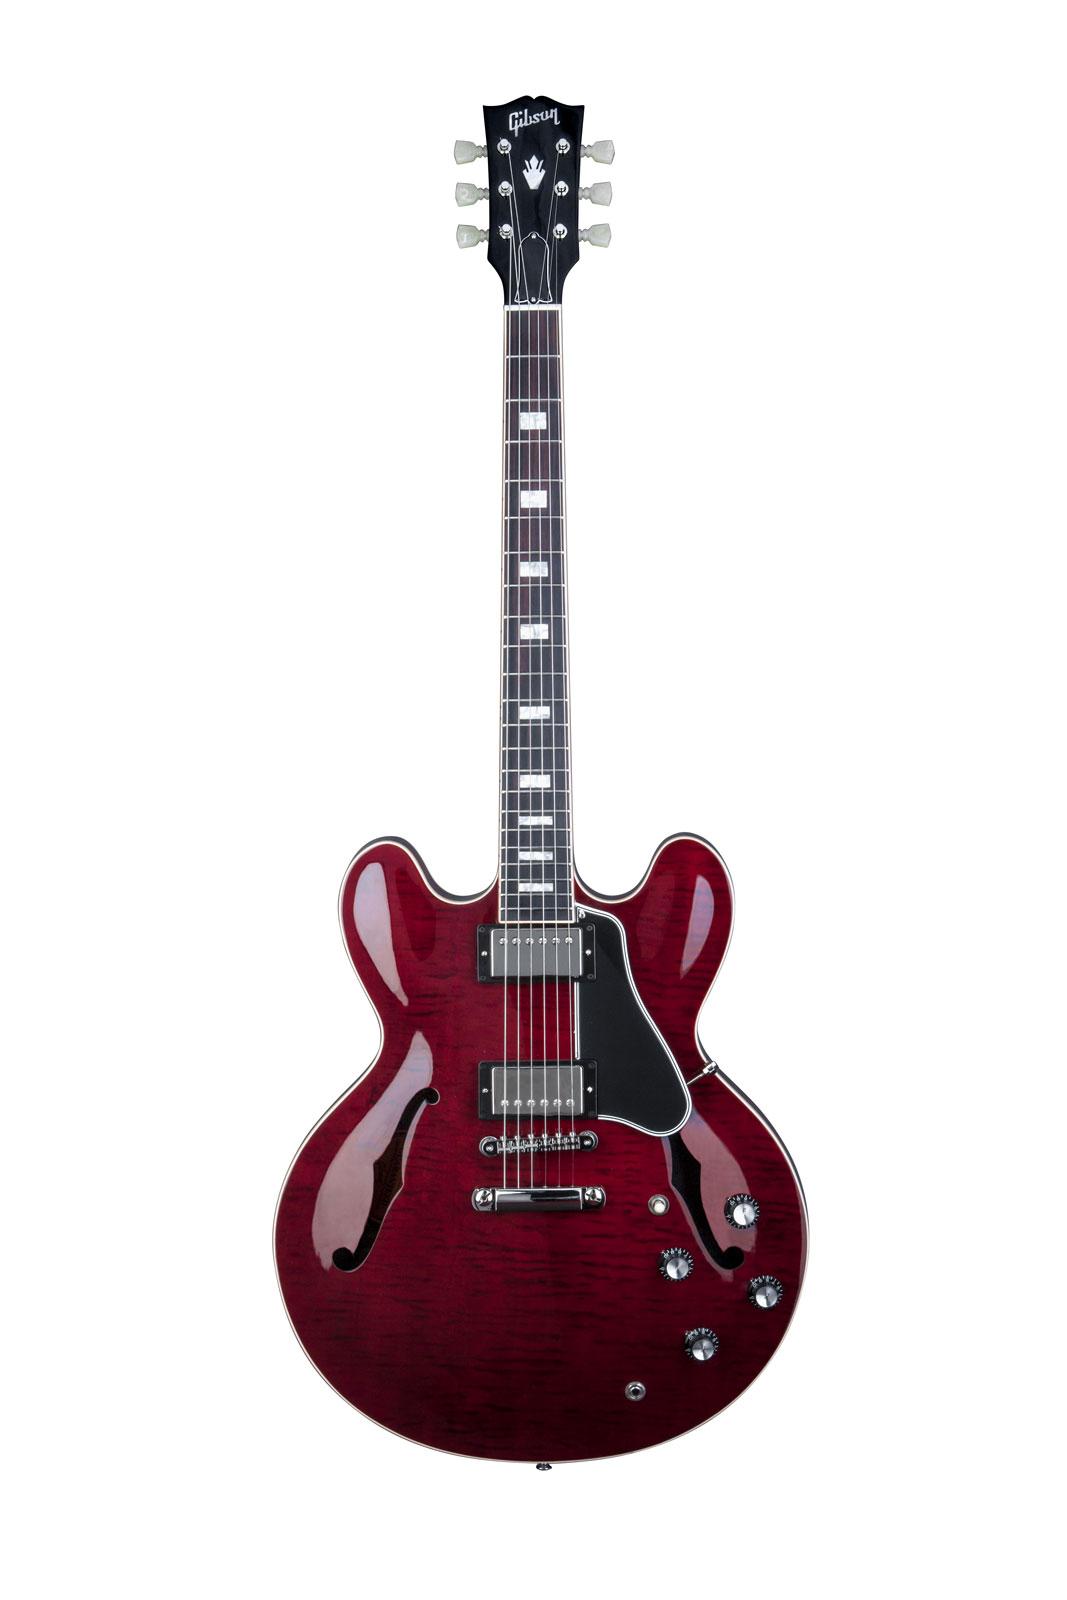 Gibson 335 Figured, 390 Neck